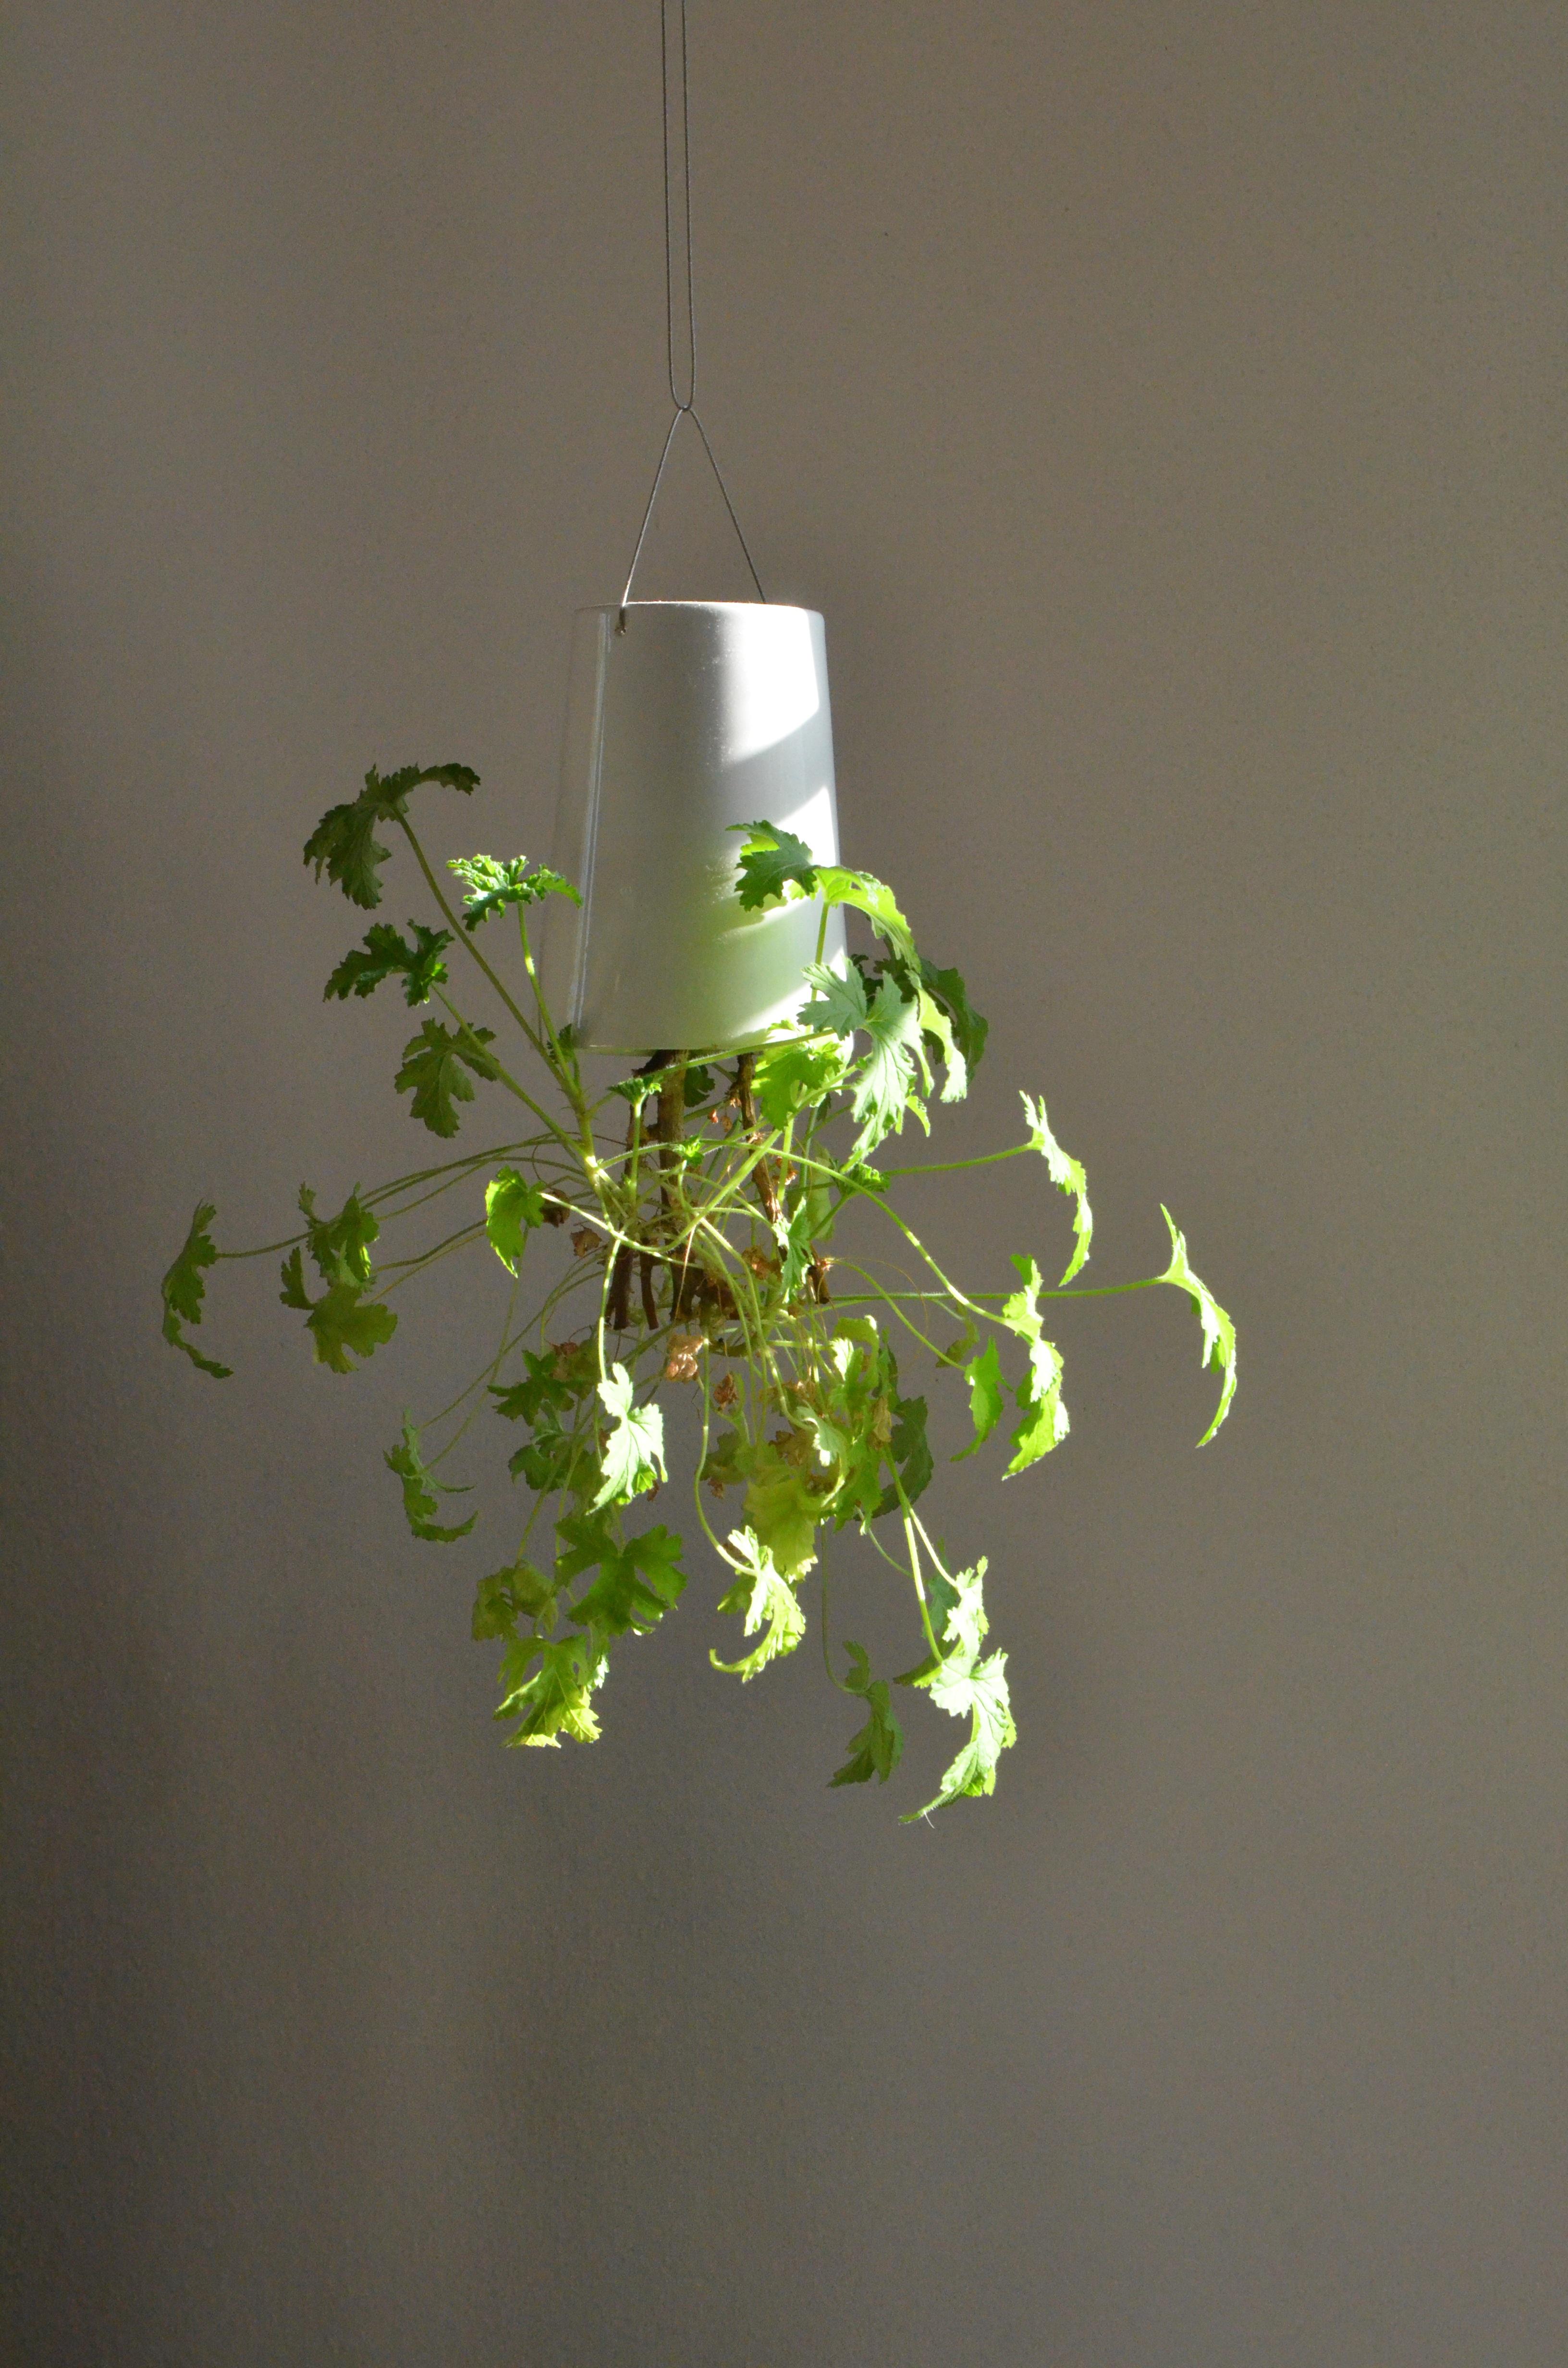 kostenlose foto ast pflanze wei blatt blume gr n lampe h ngend beleuchtung zweig. Black Bedroom Furniture Sets. Home Design Ideas